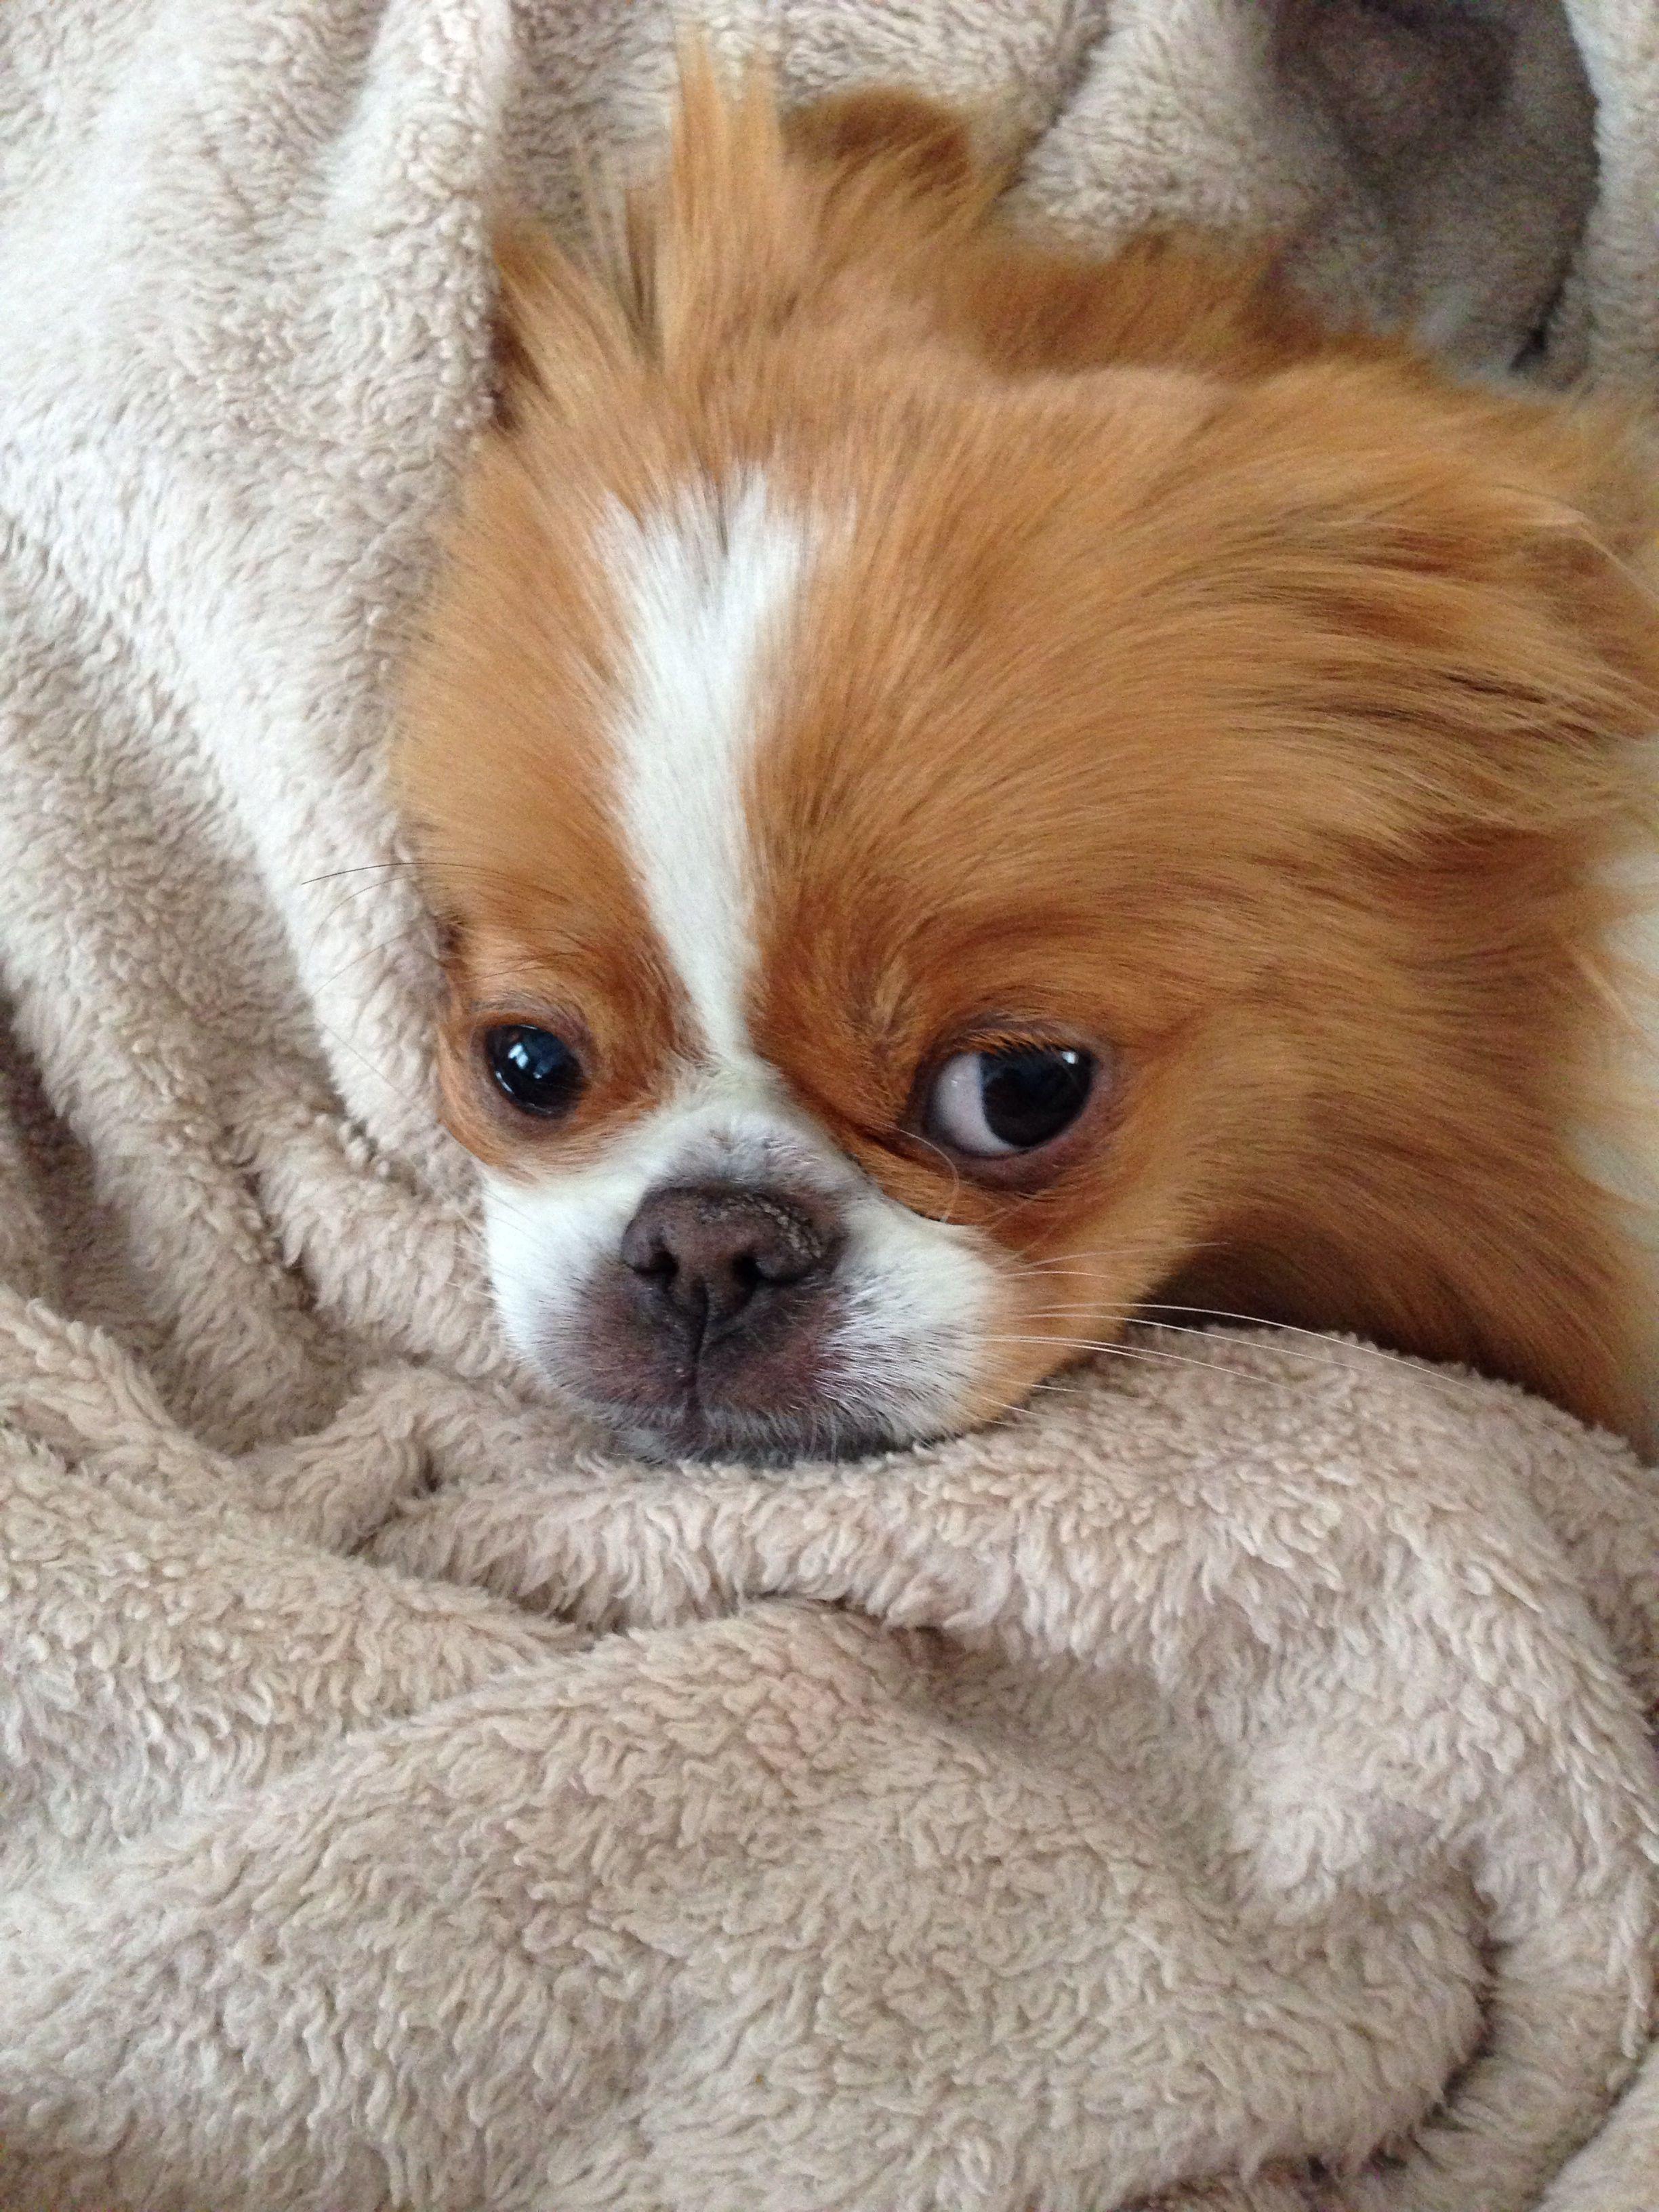 Japanese Chin dog art portraits, photographs, information